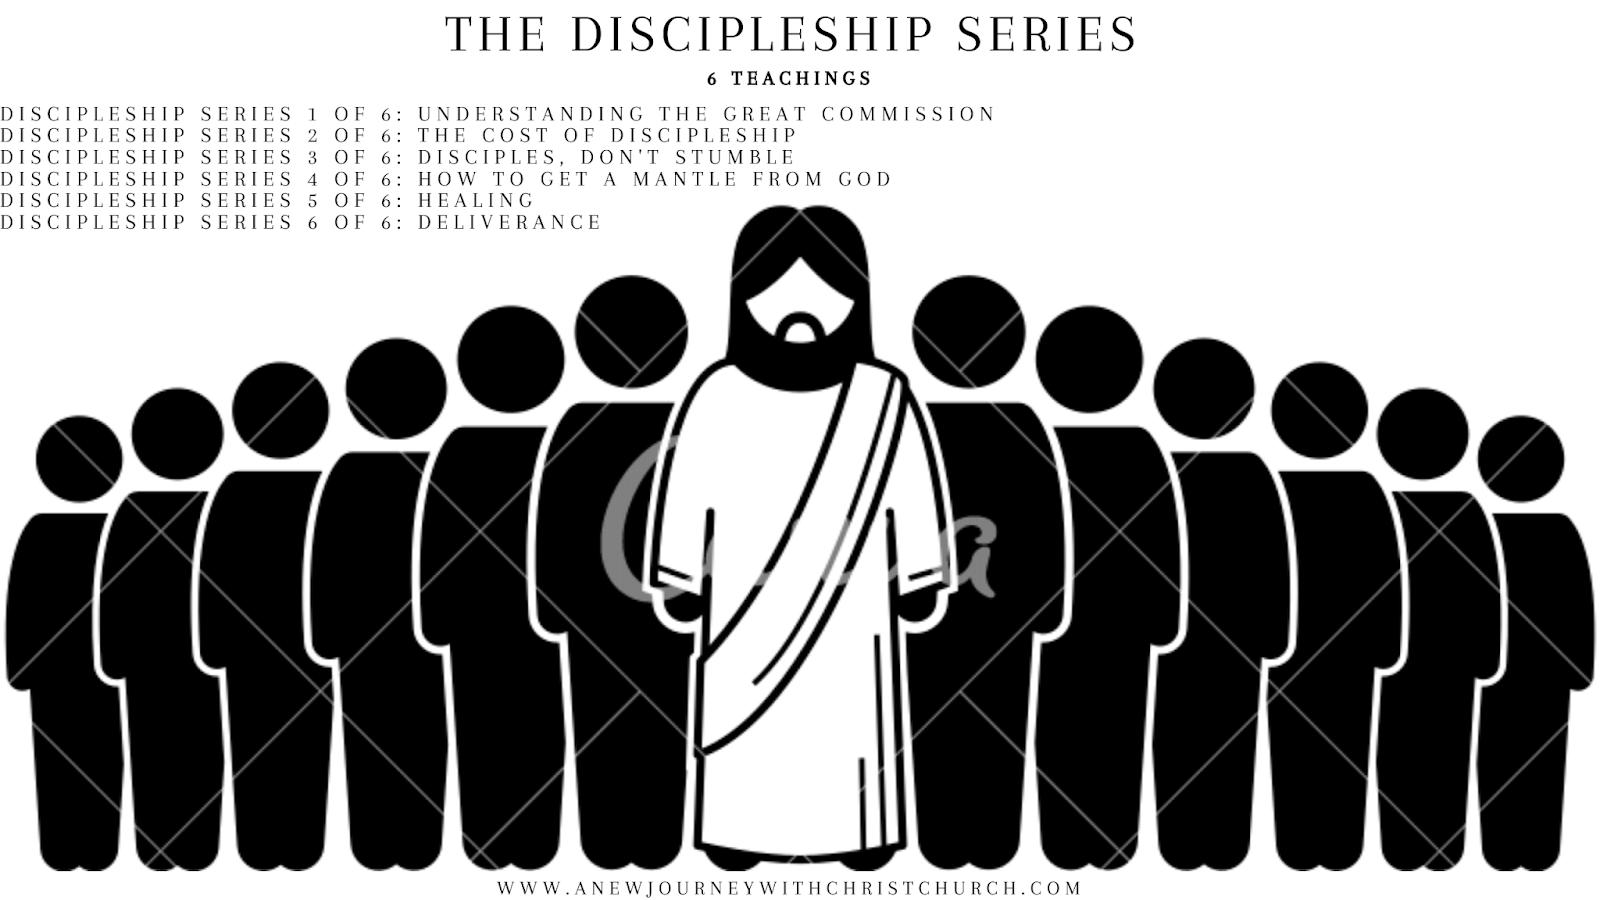 Discipleship Series 3 of 6: Disciples, Don't Stumble!